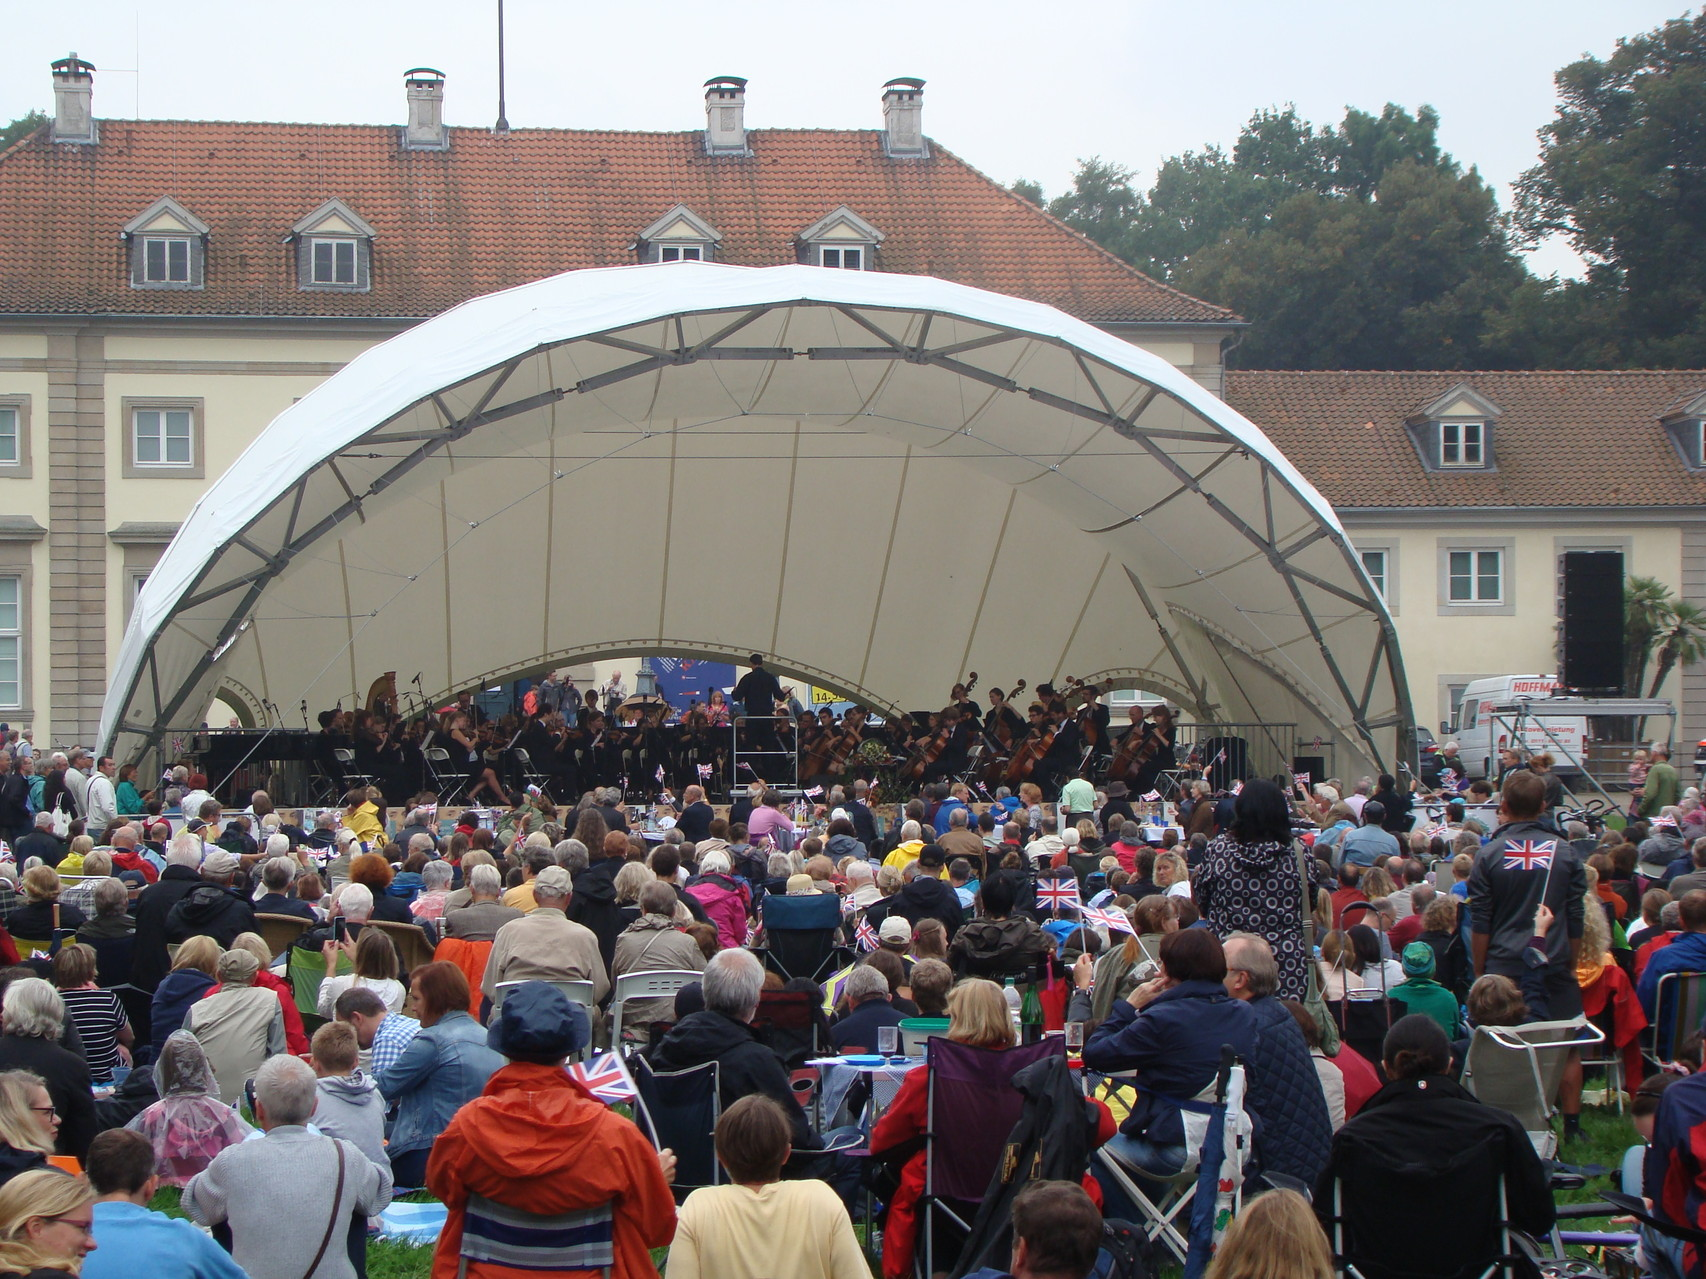 Orchester Open Air, Open Air Bühne, Klassik Open Air, Georgengarten Hannover, Wilhelm Busch Museum